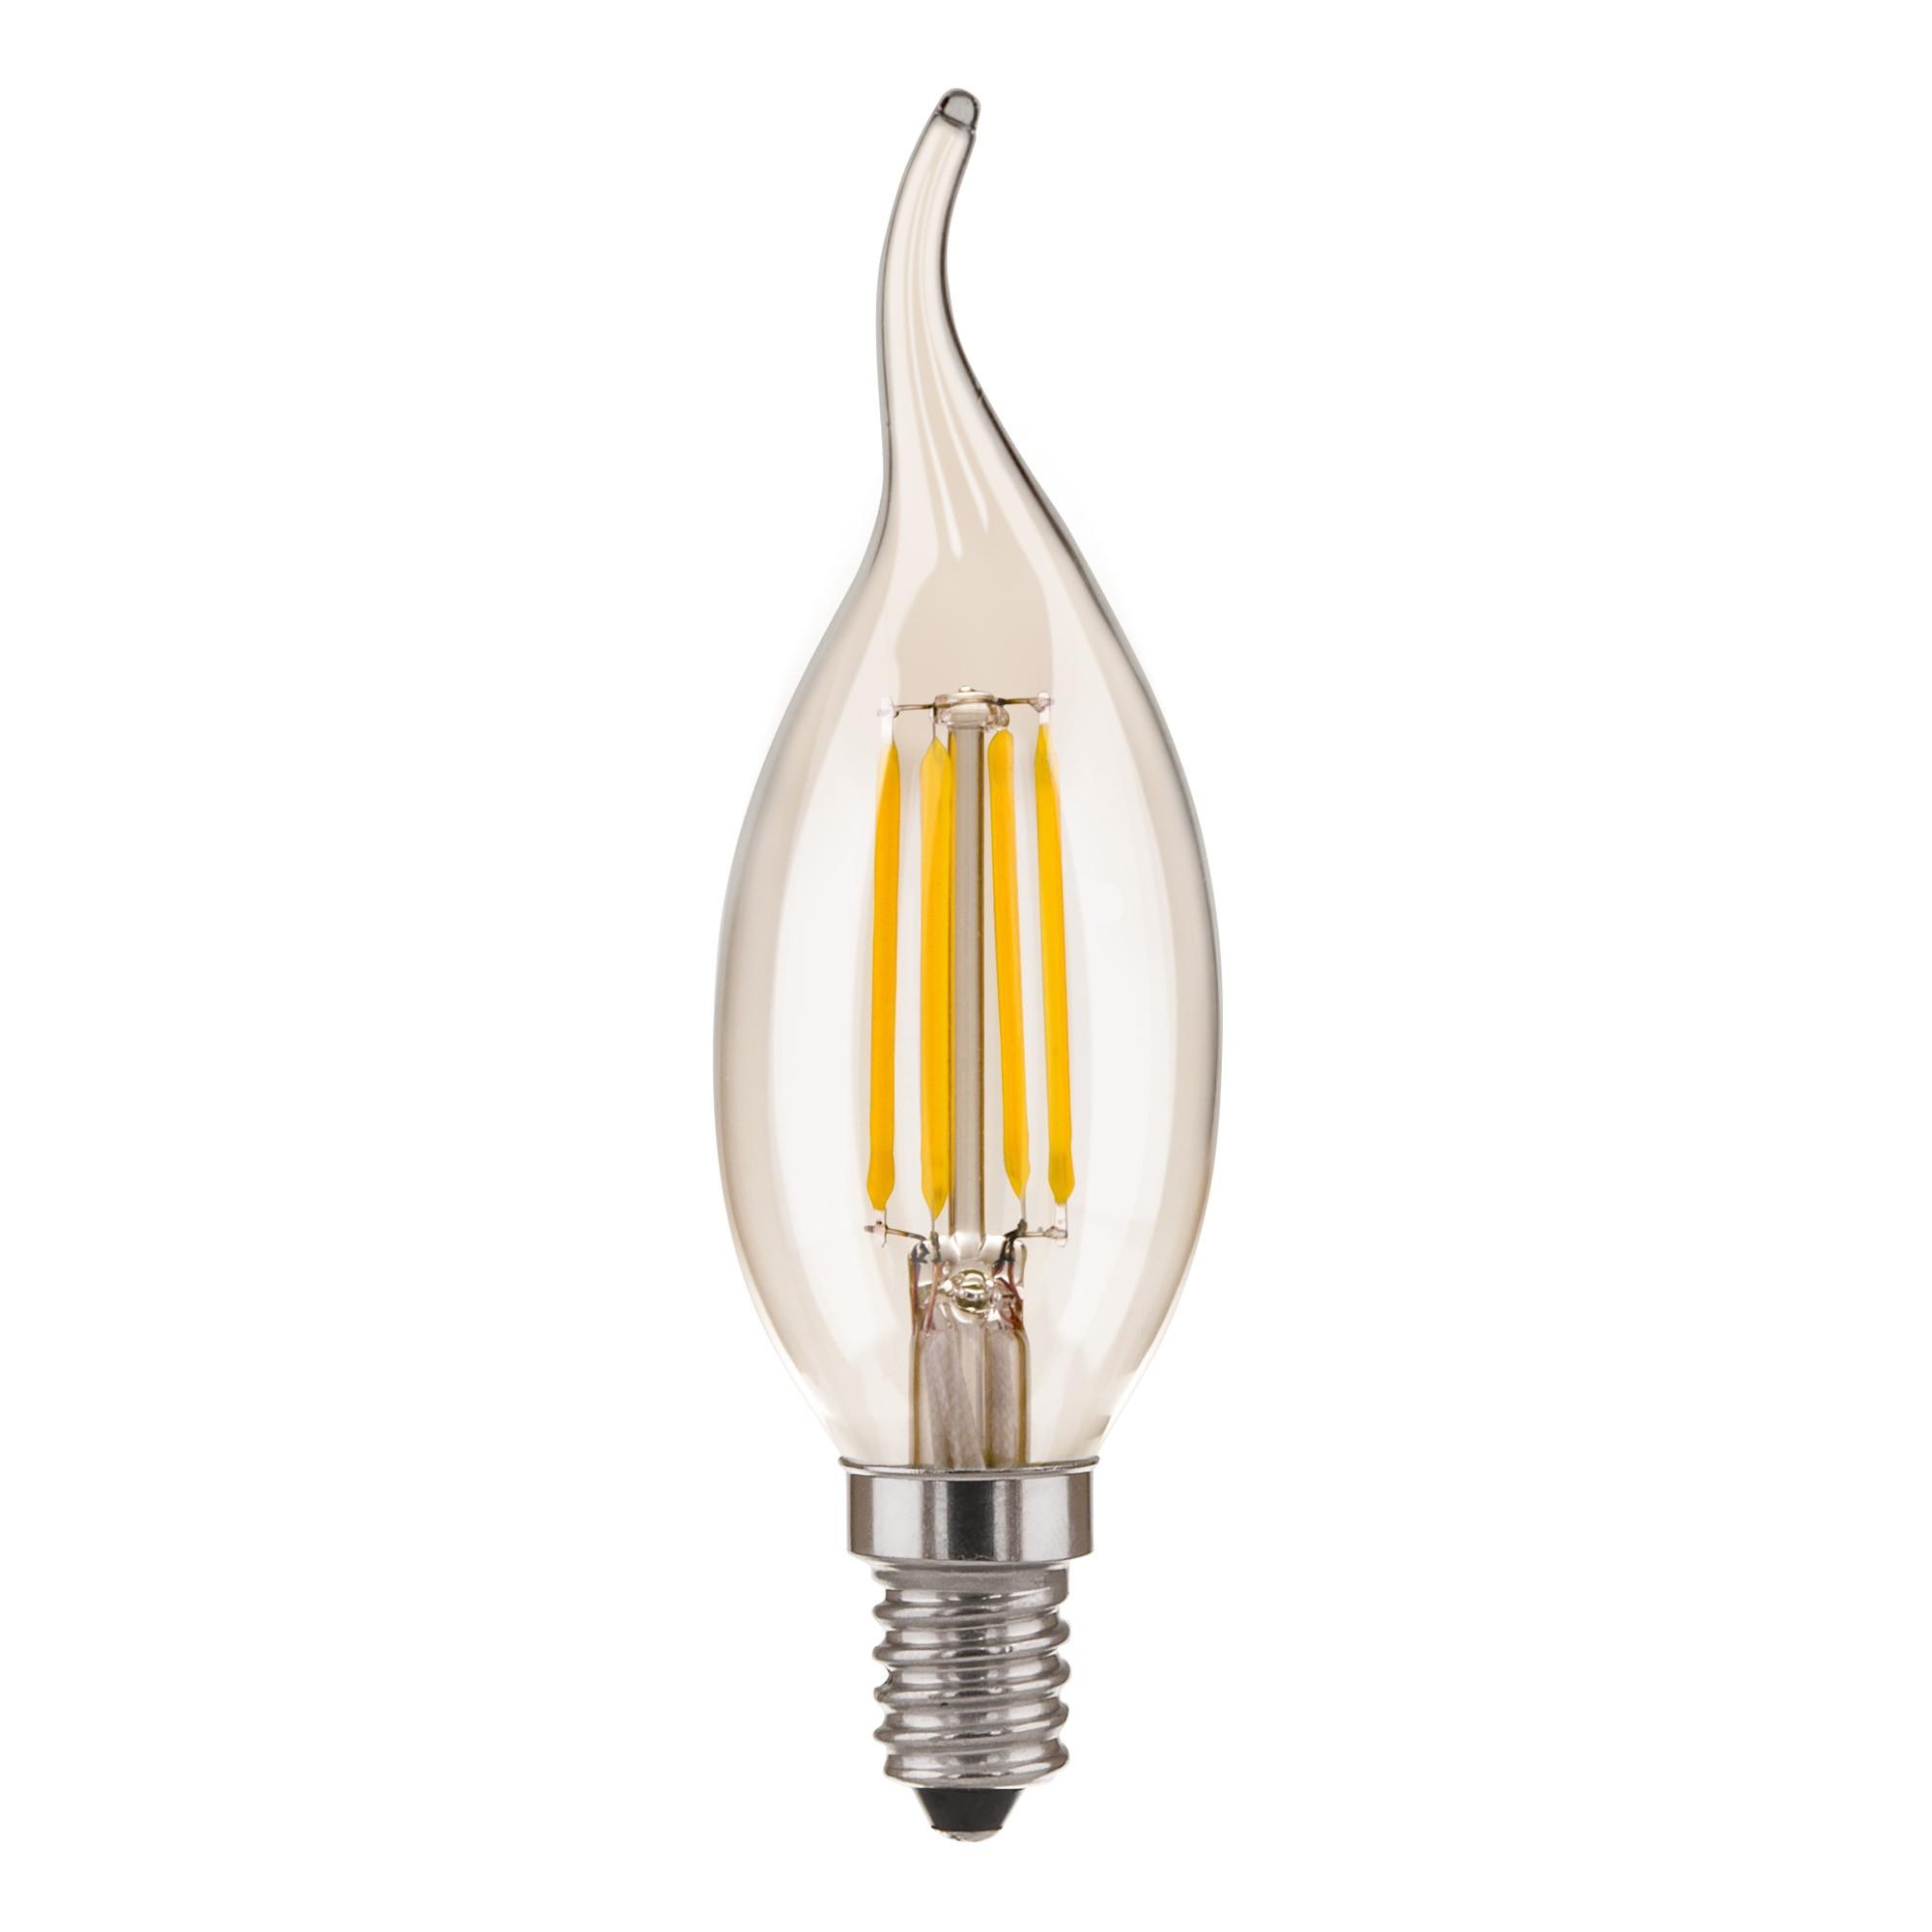 Свеча на ветру BLE1428 9W 3300K E14 (CW35 прозрачный)